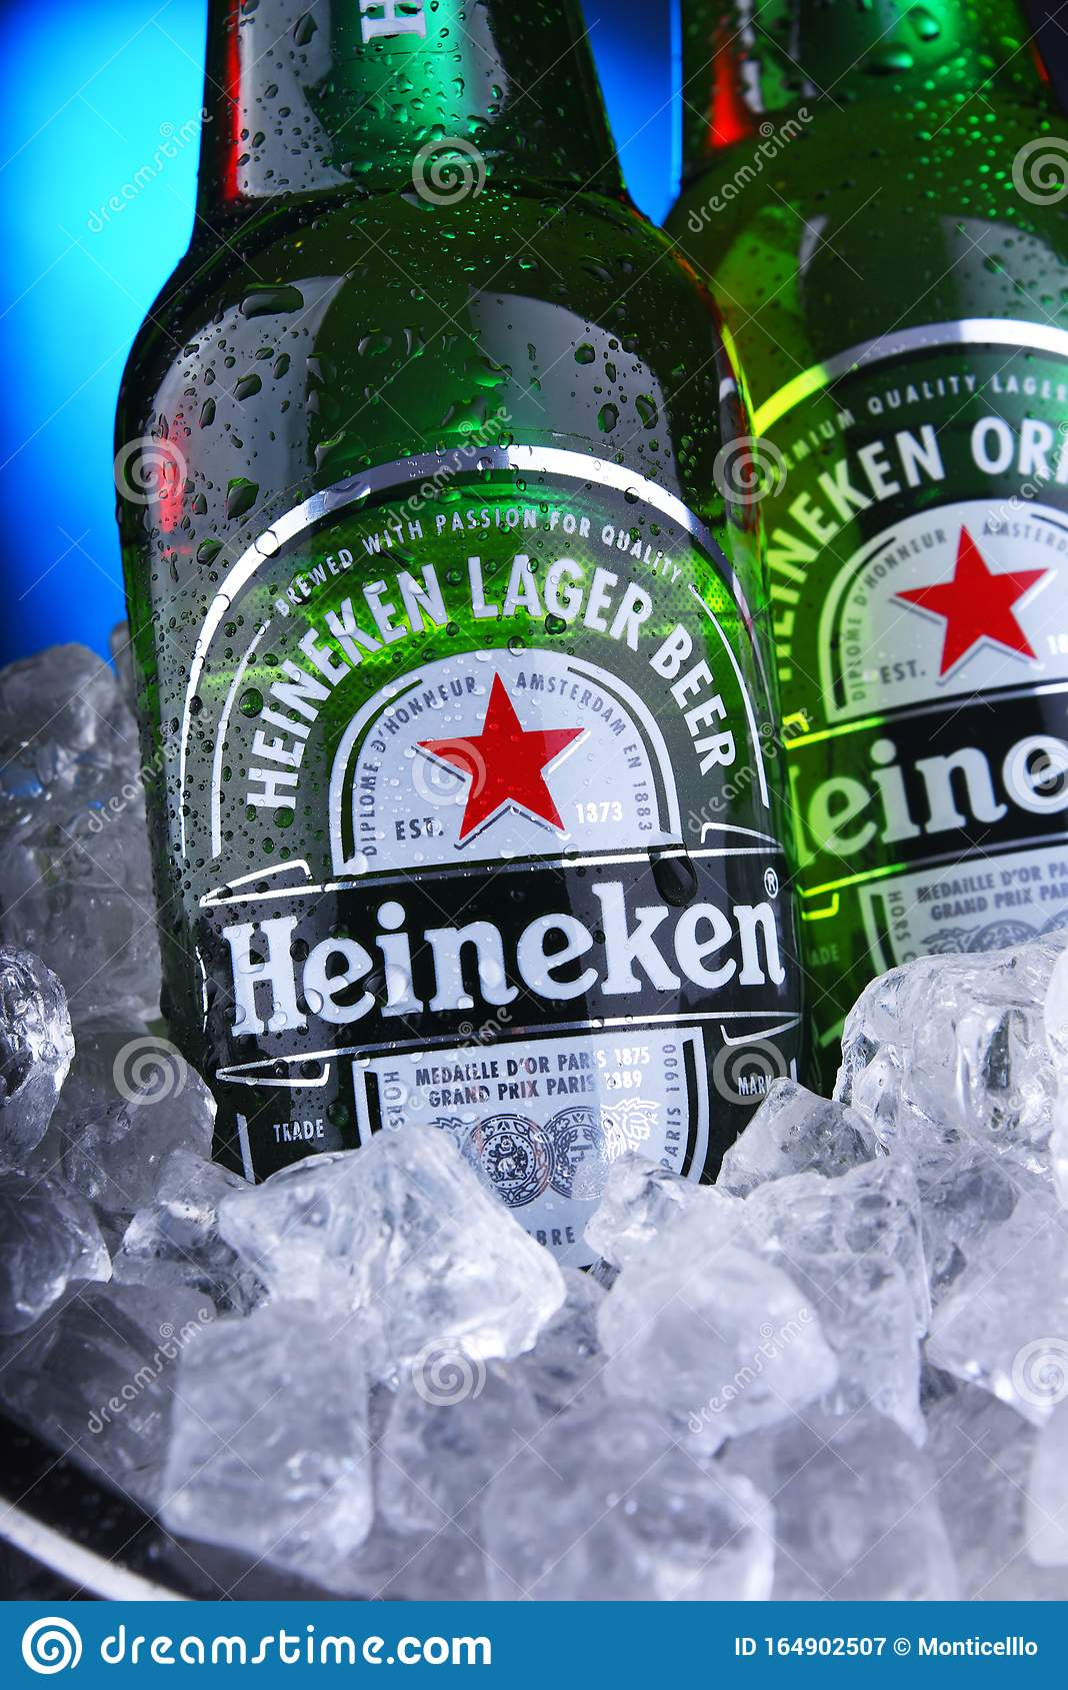 2 093 Heineken Beer Photos Free Royalty Free Stock Photos From Dreamstime